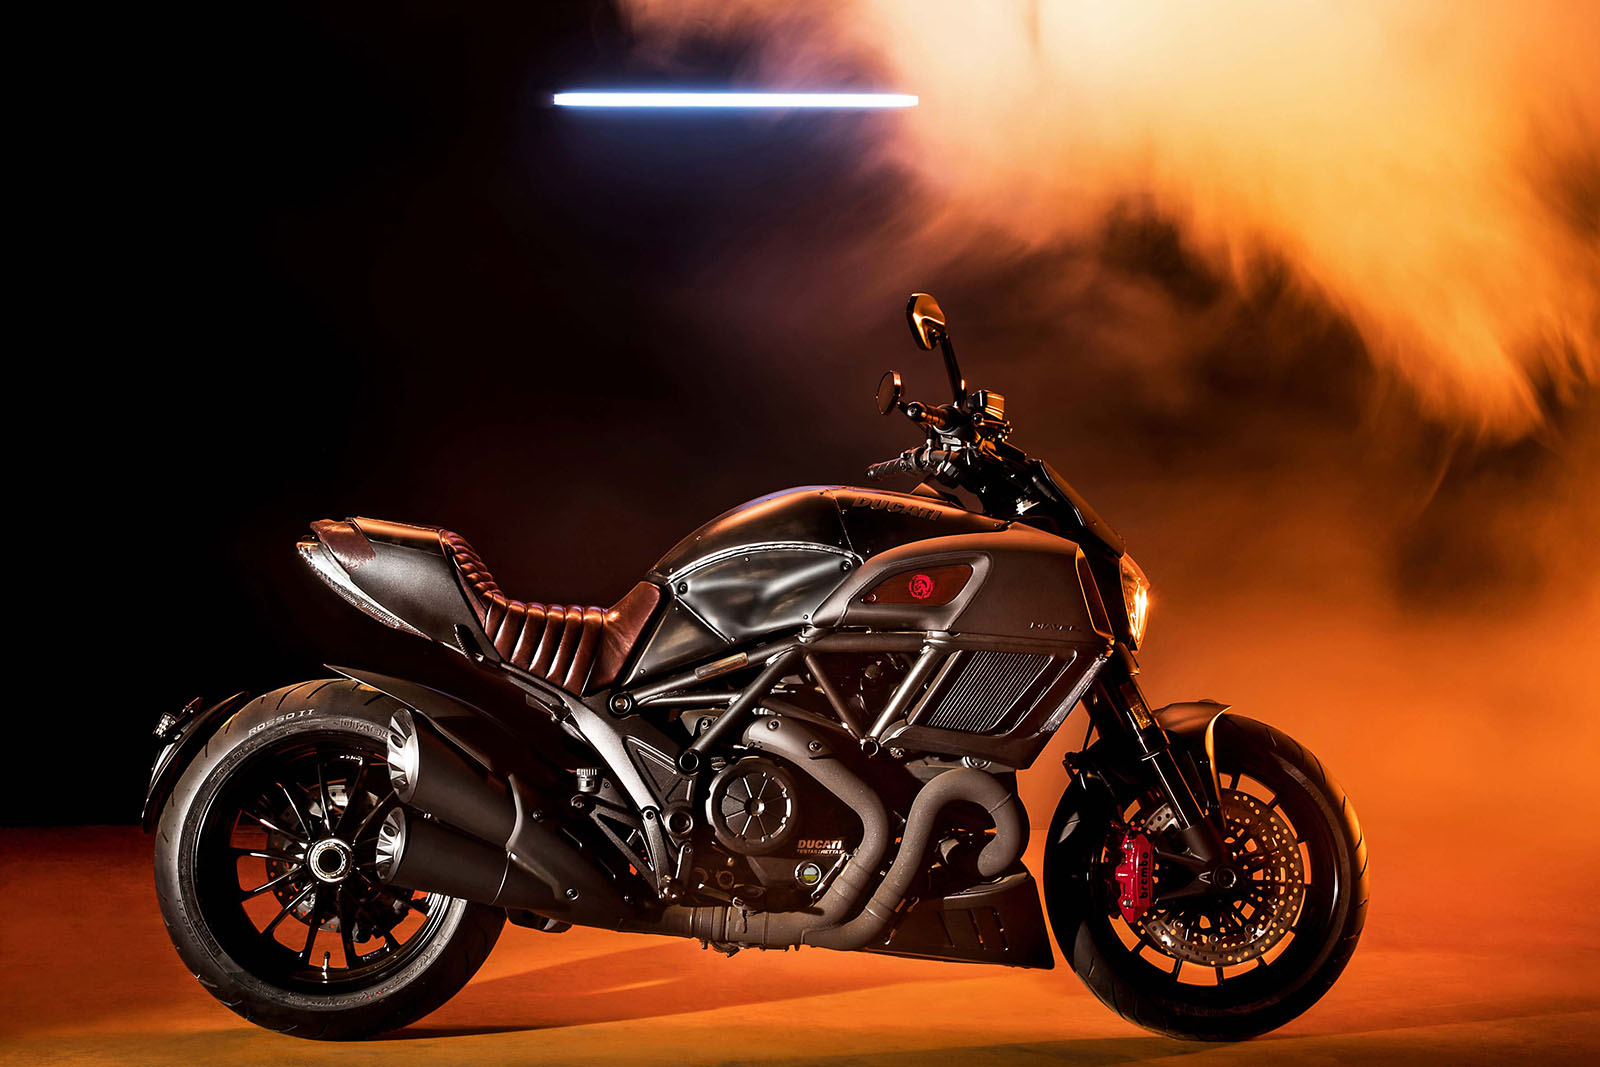 Новый Ducati Diavel Diesel: никогда не оглядывайся назад